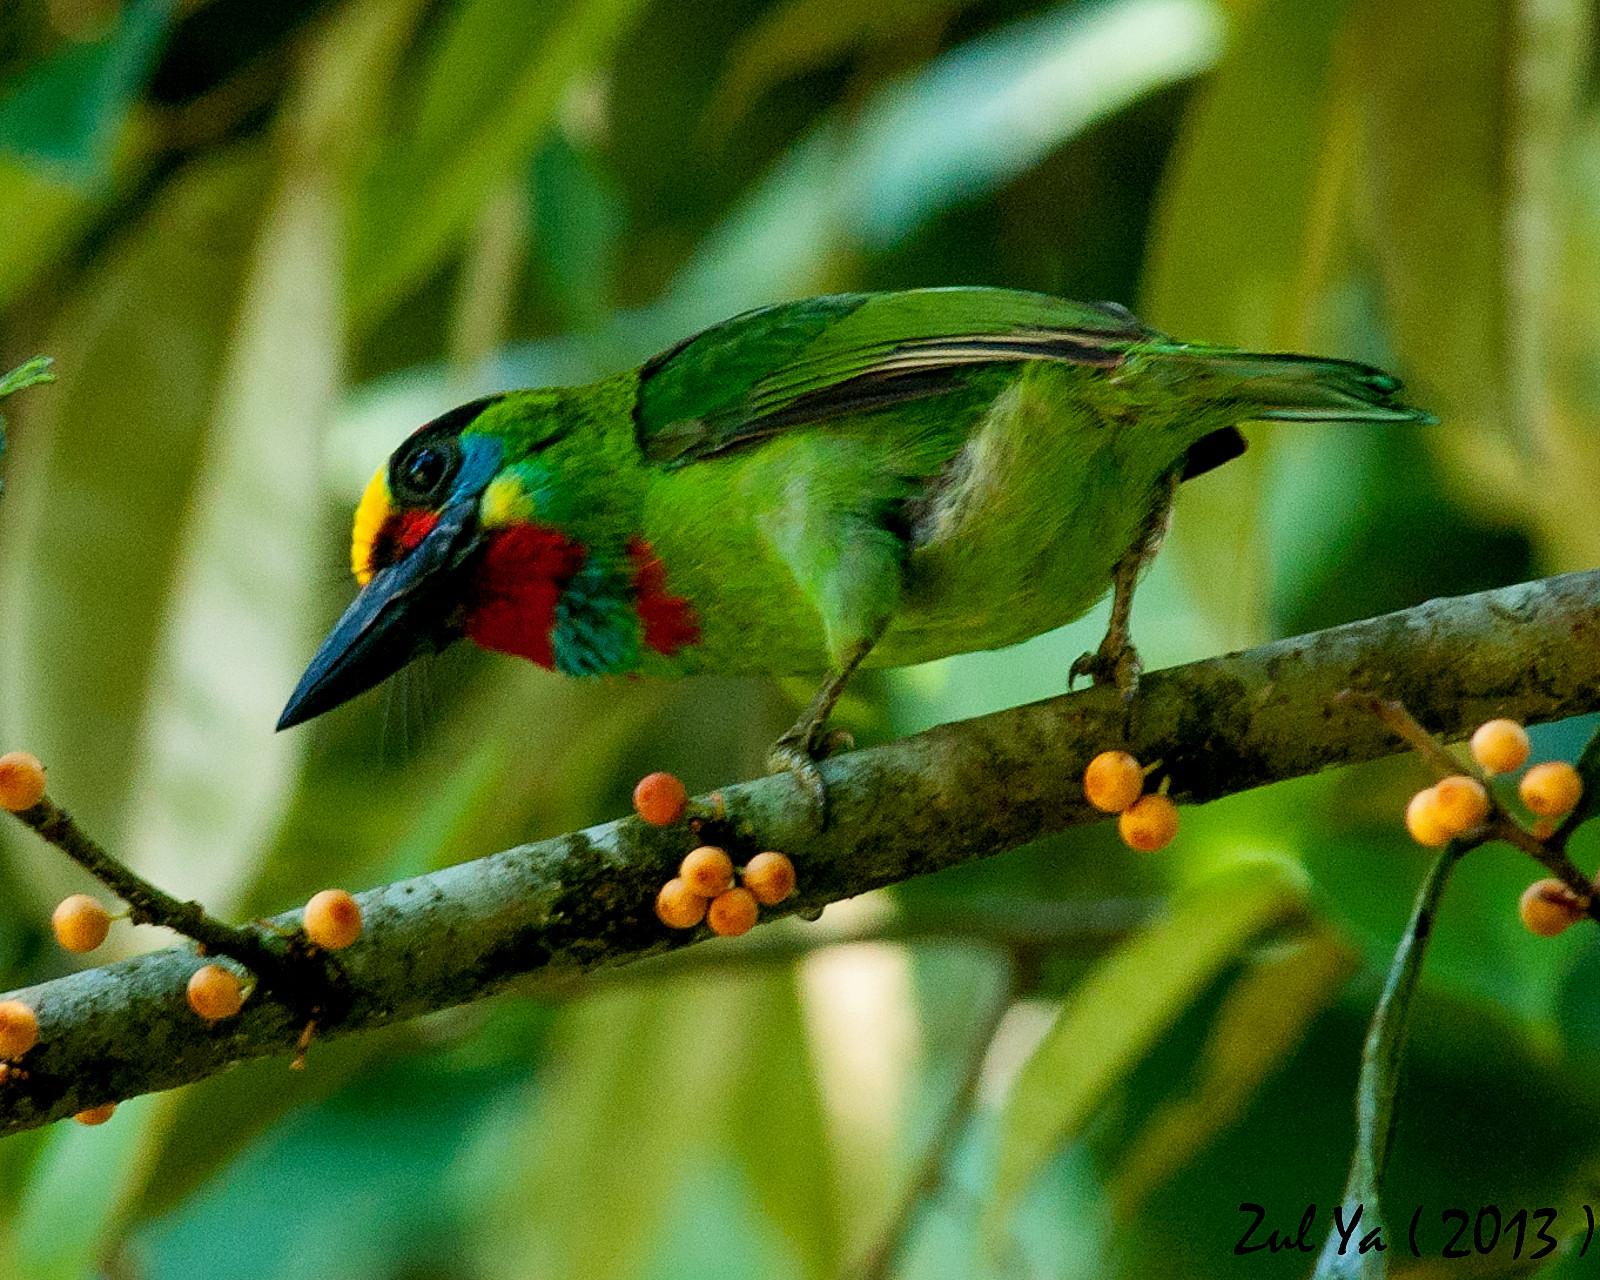 Xc >> Zul Ya - Birds of Peninsular Malaysia: Colourful Barbets